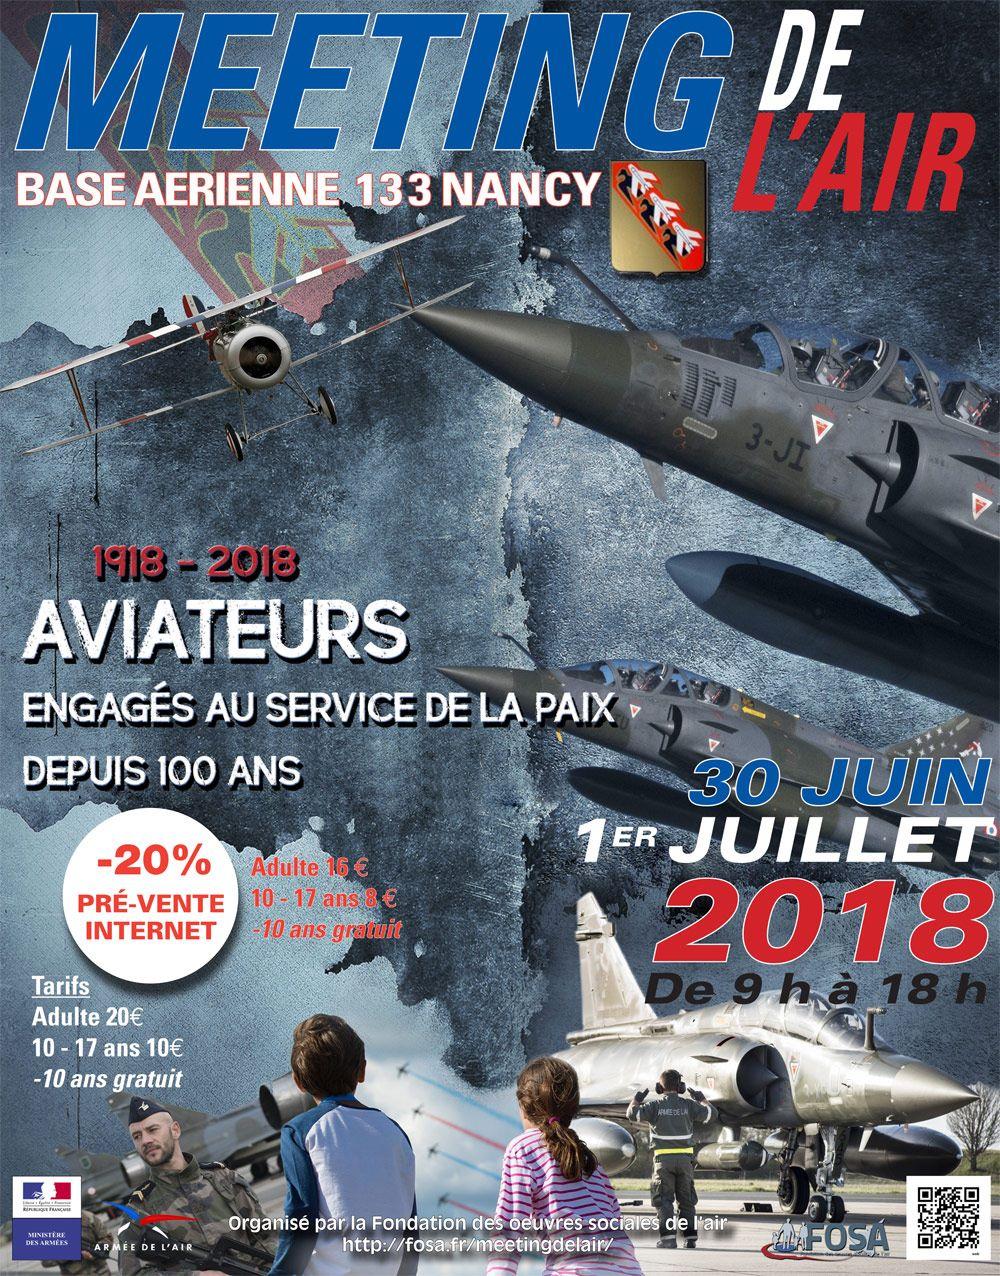 Meeting de l'Air Base Aerienne 133 Nancy - Ochey 2018